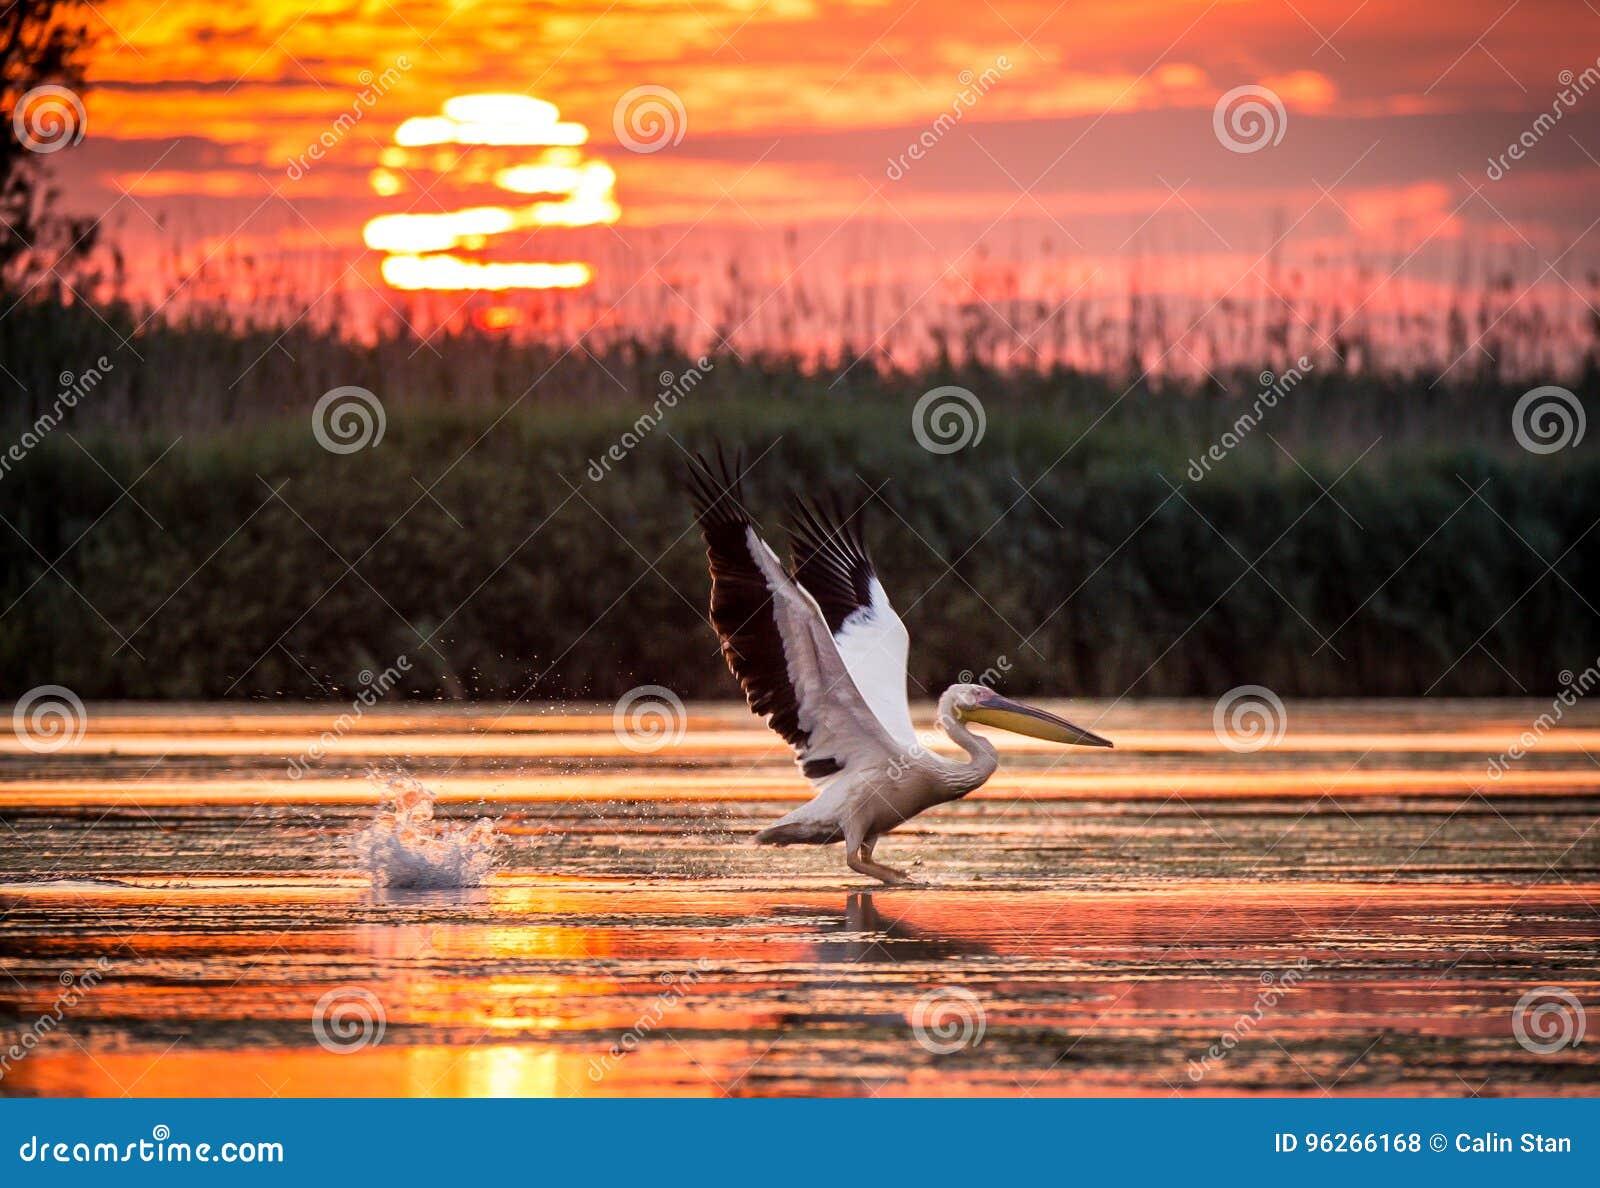 Пеликаны летая на восход солнца в перепаде Дуная, Румыния